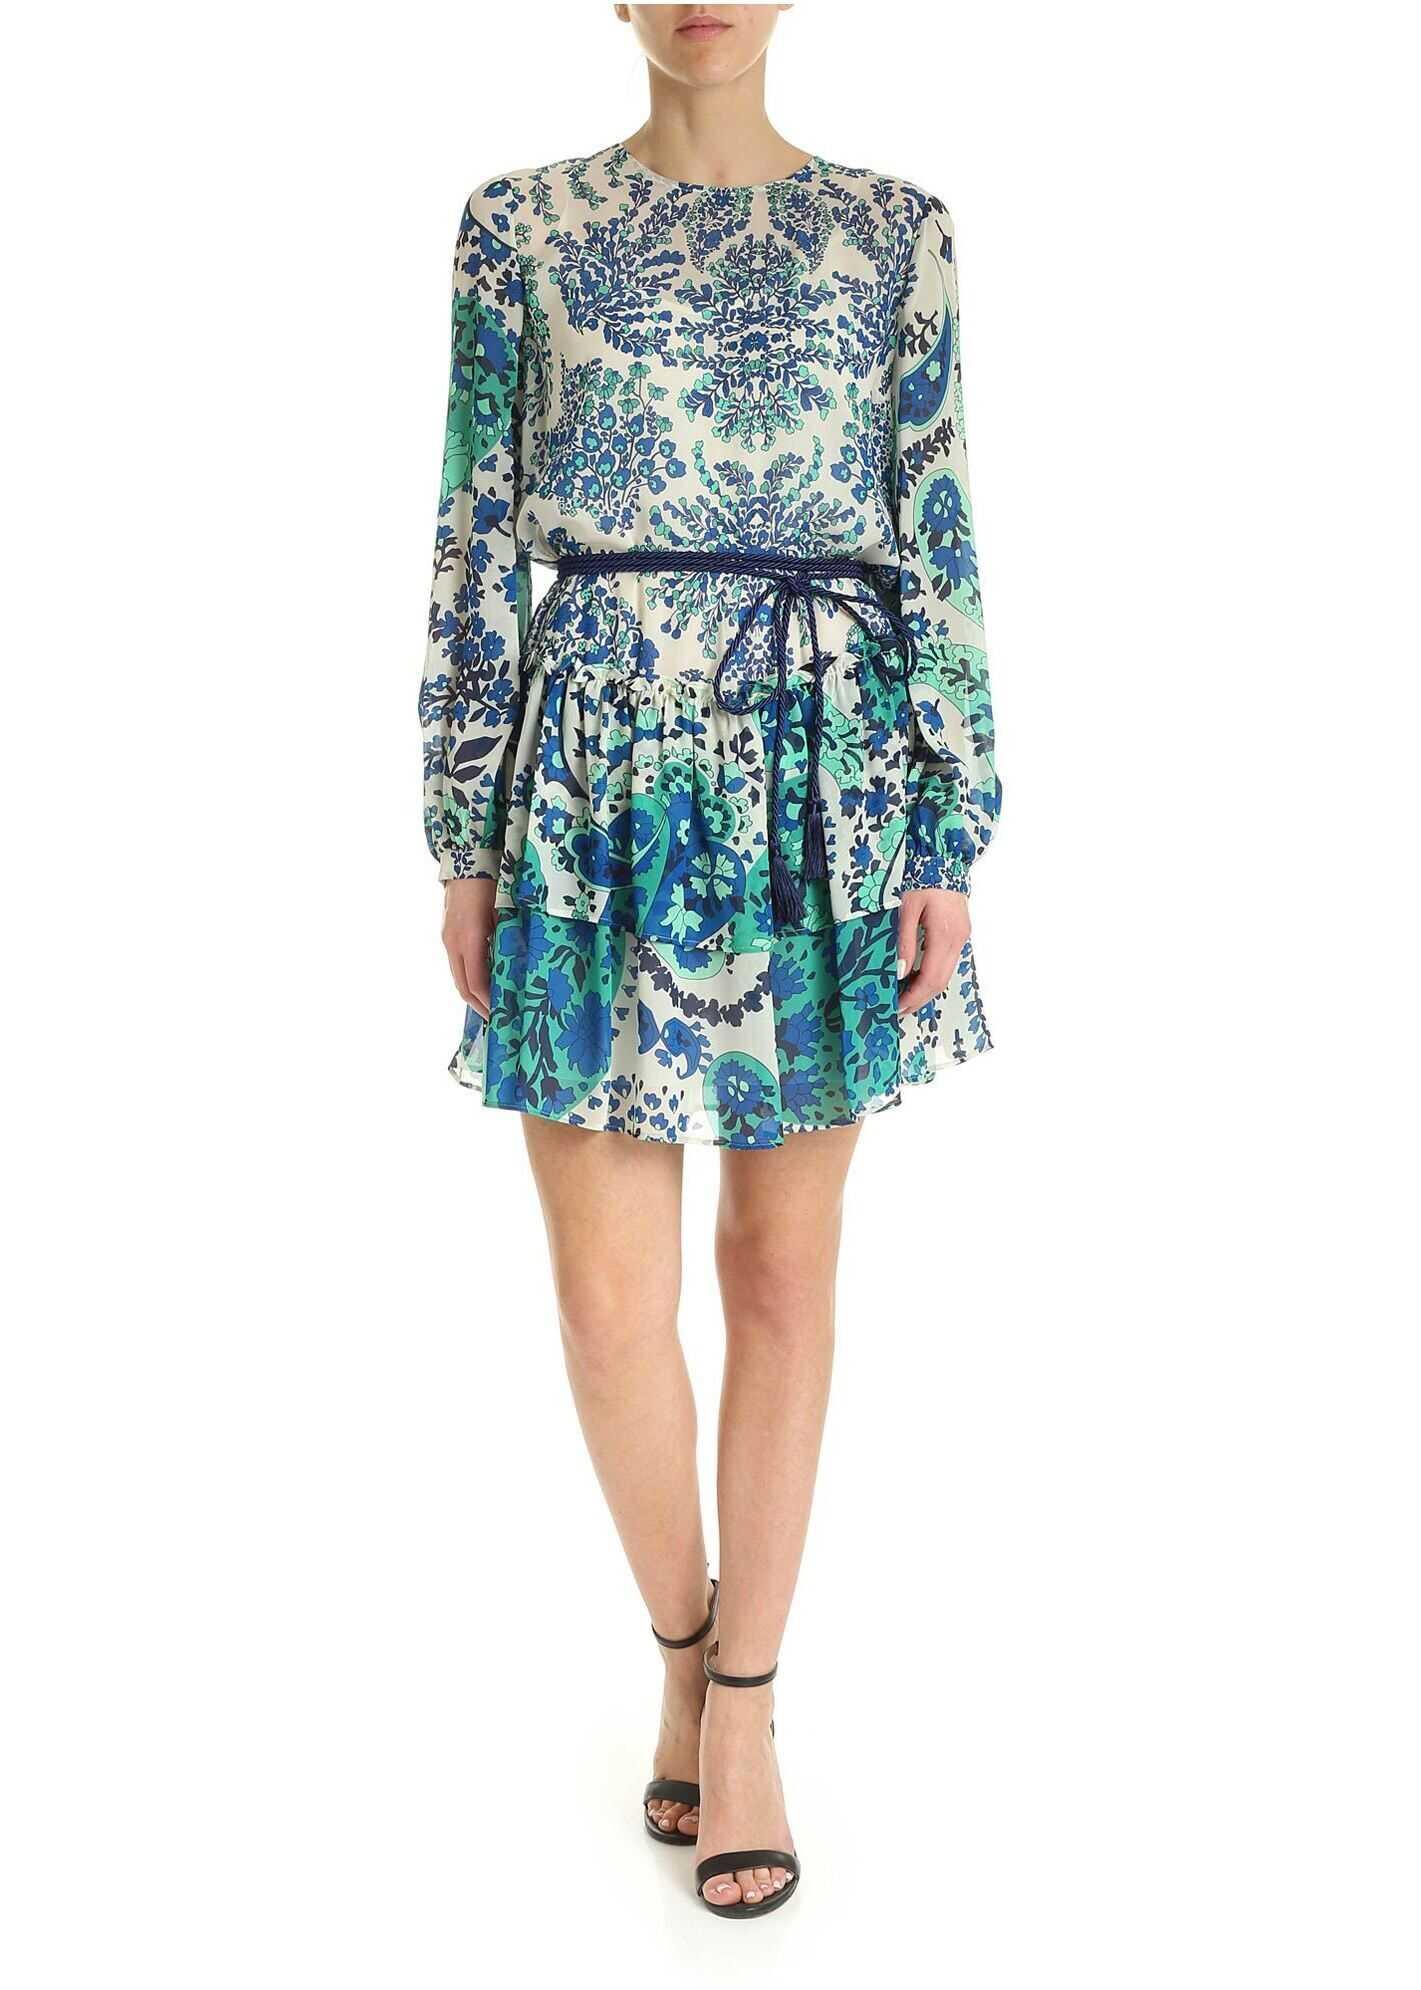 Twin-set Simona Barbieri Printed Viscose Dress In Shades Of Blue Blue